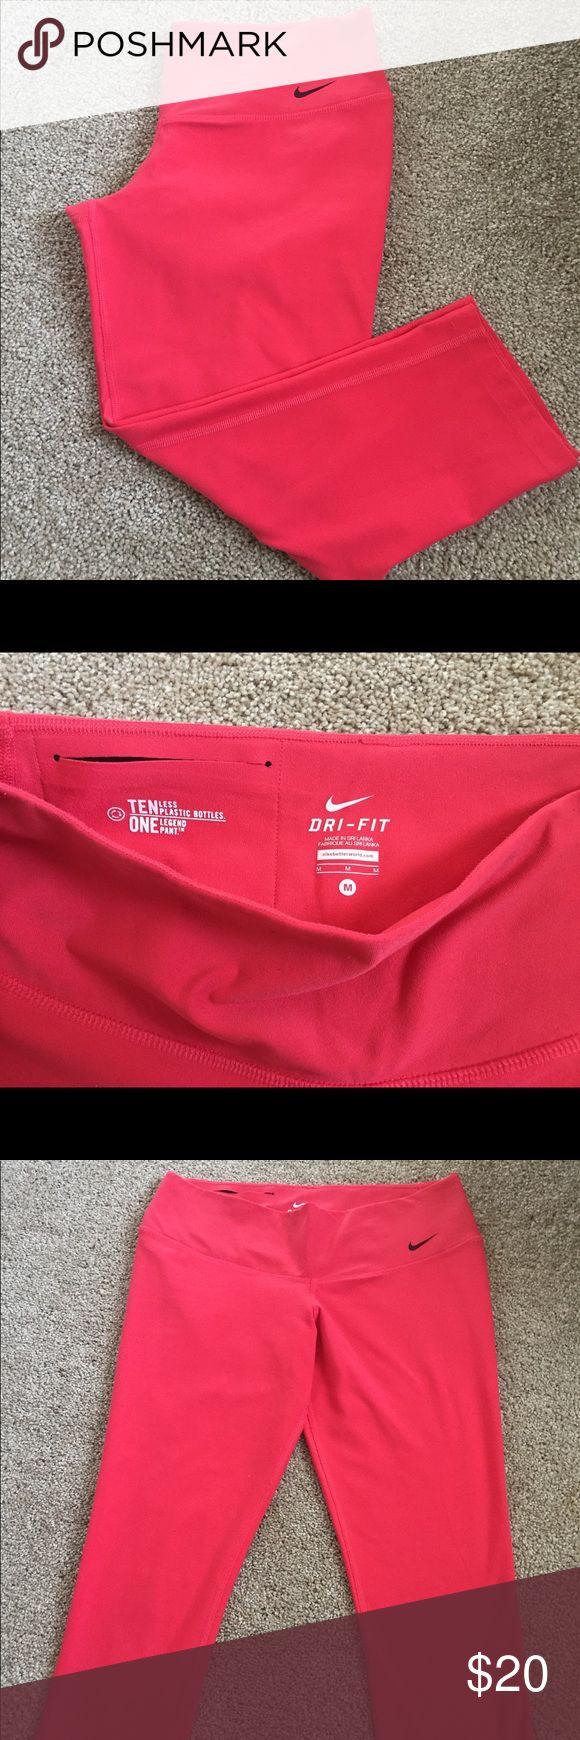 Nike Dri-Fit Capri Pants Bright pink capris-length workout pants. Tight fitting. Excellent used condition! Nike Pants Capris